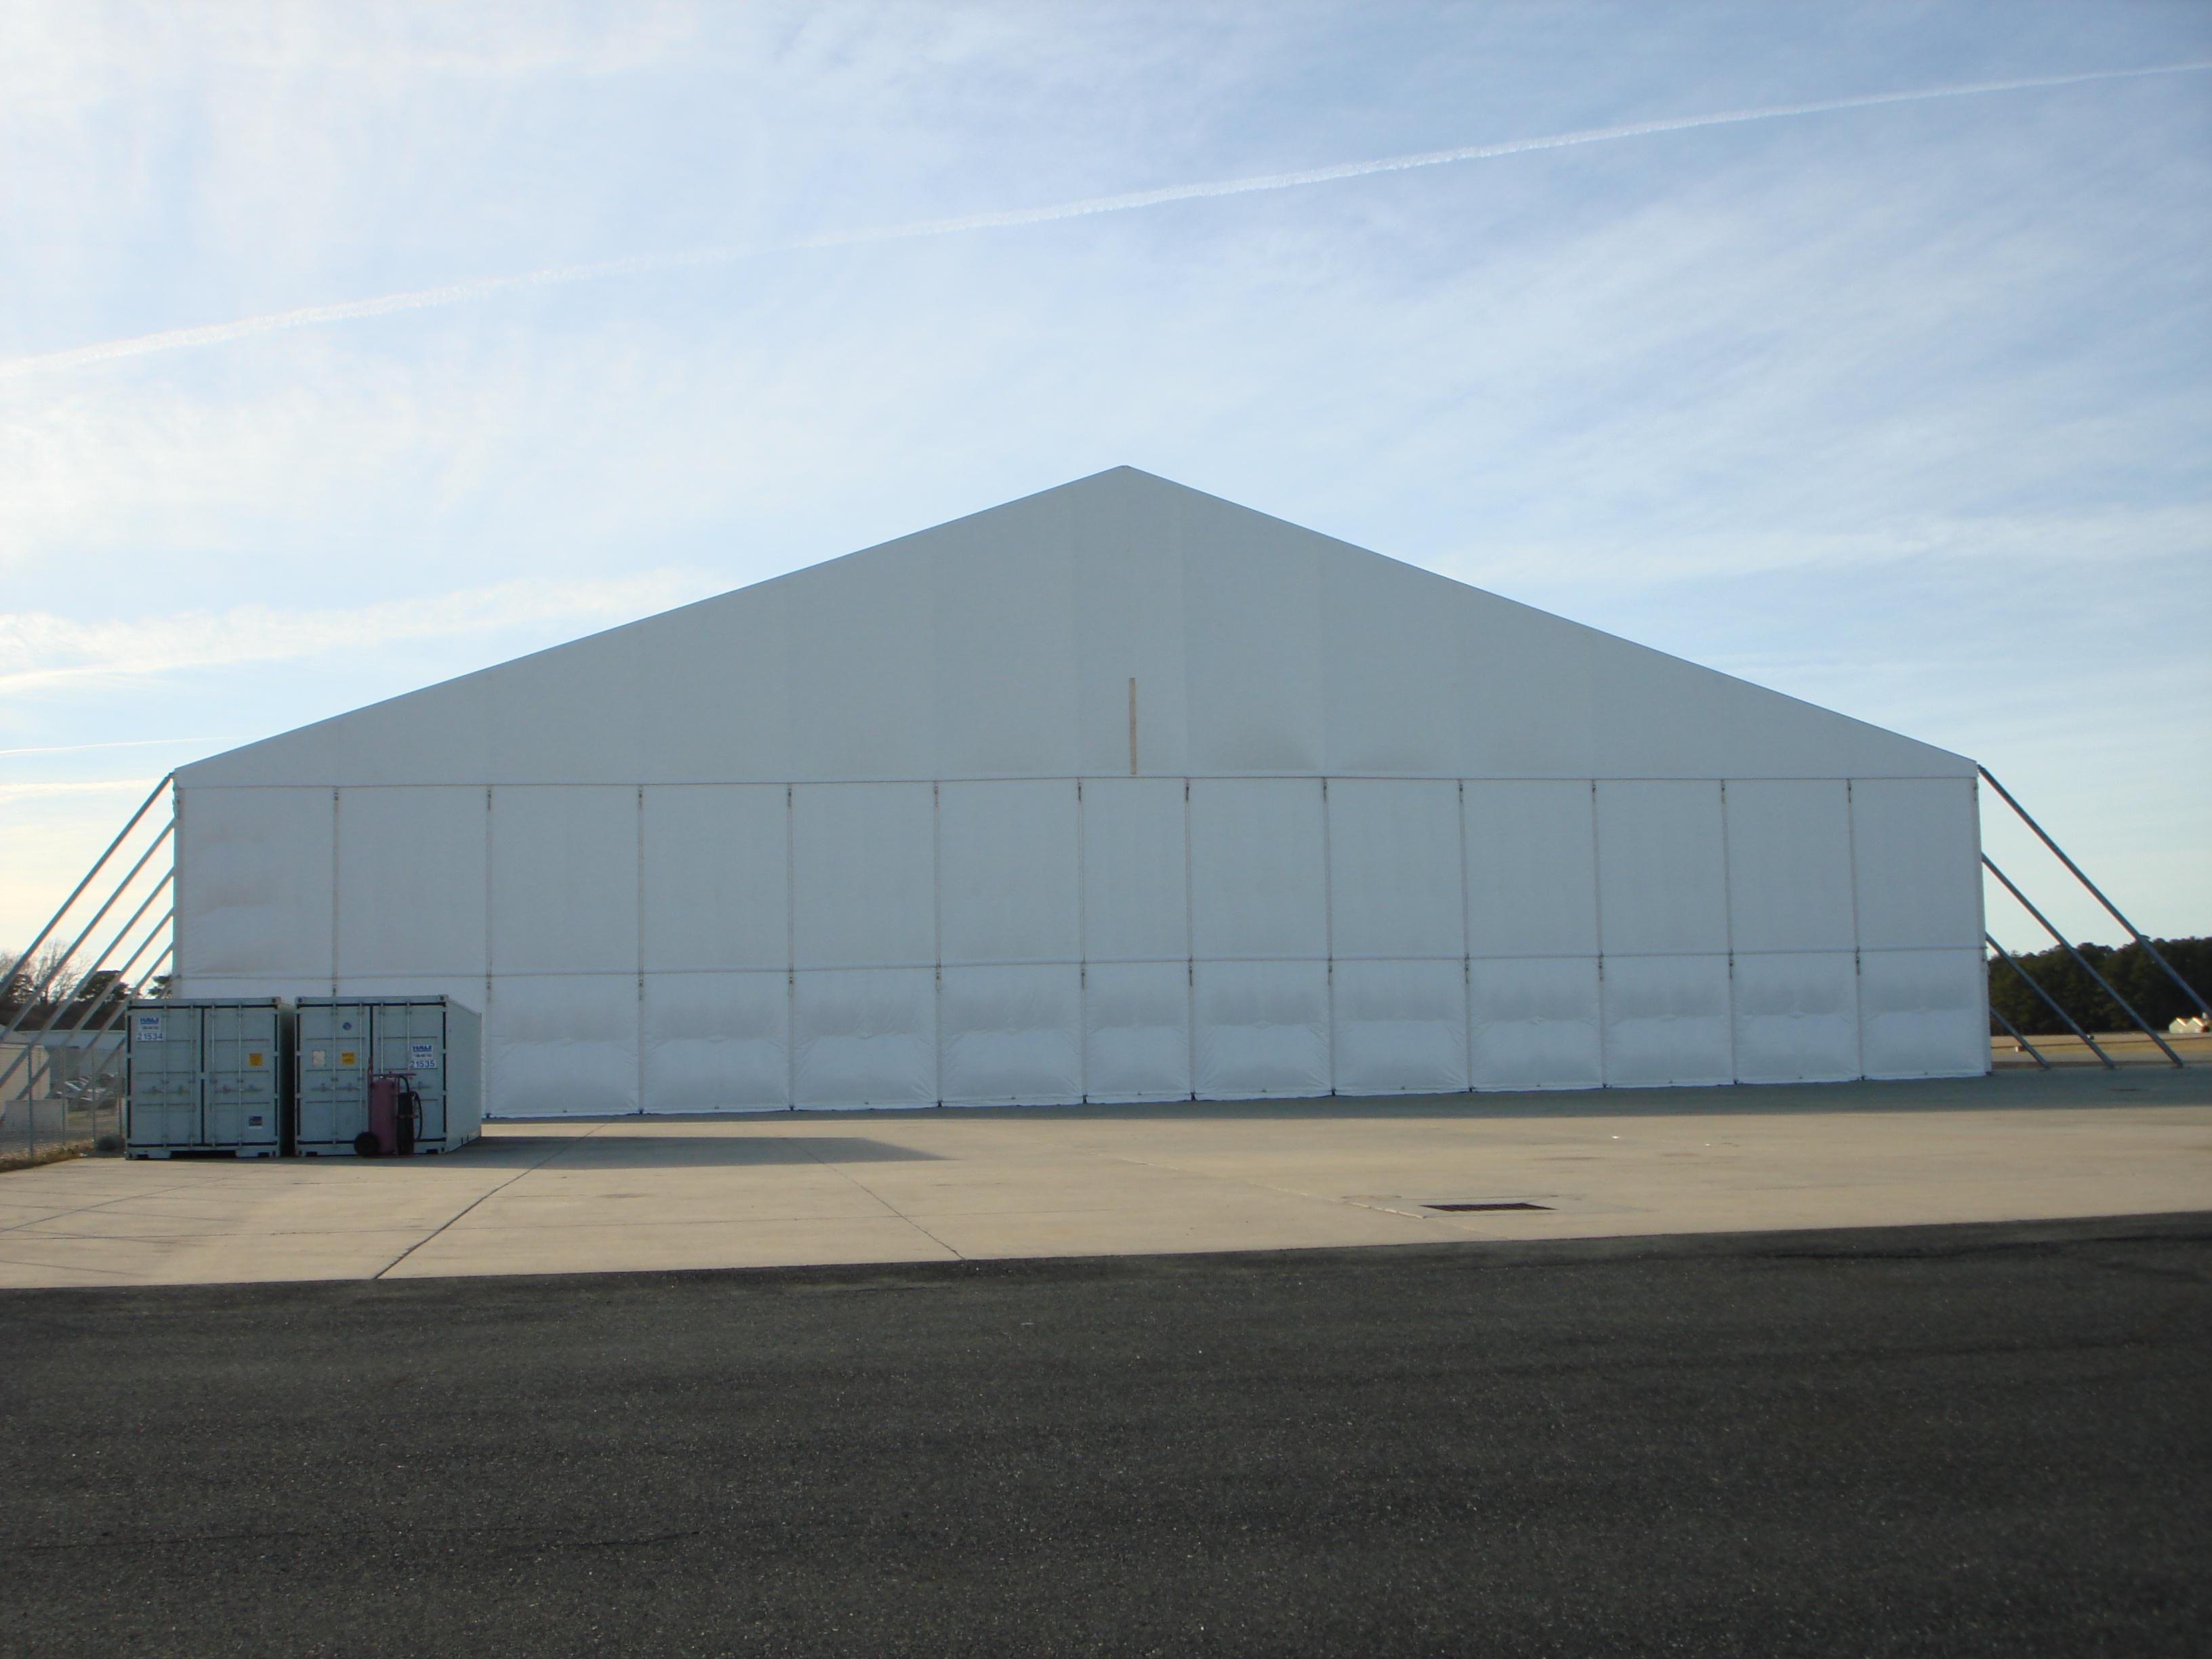 BaySys-001-Megastructure™-Exterior-Gable